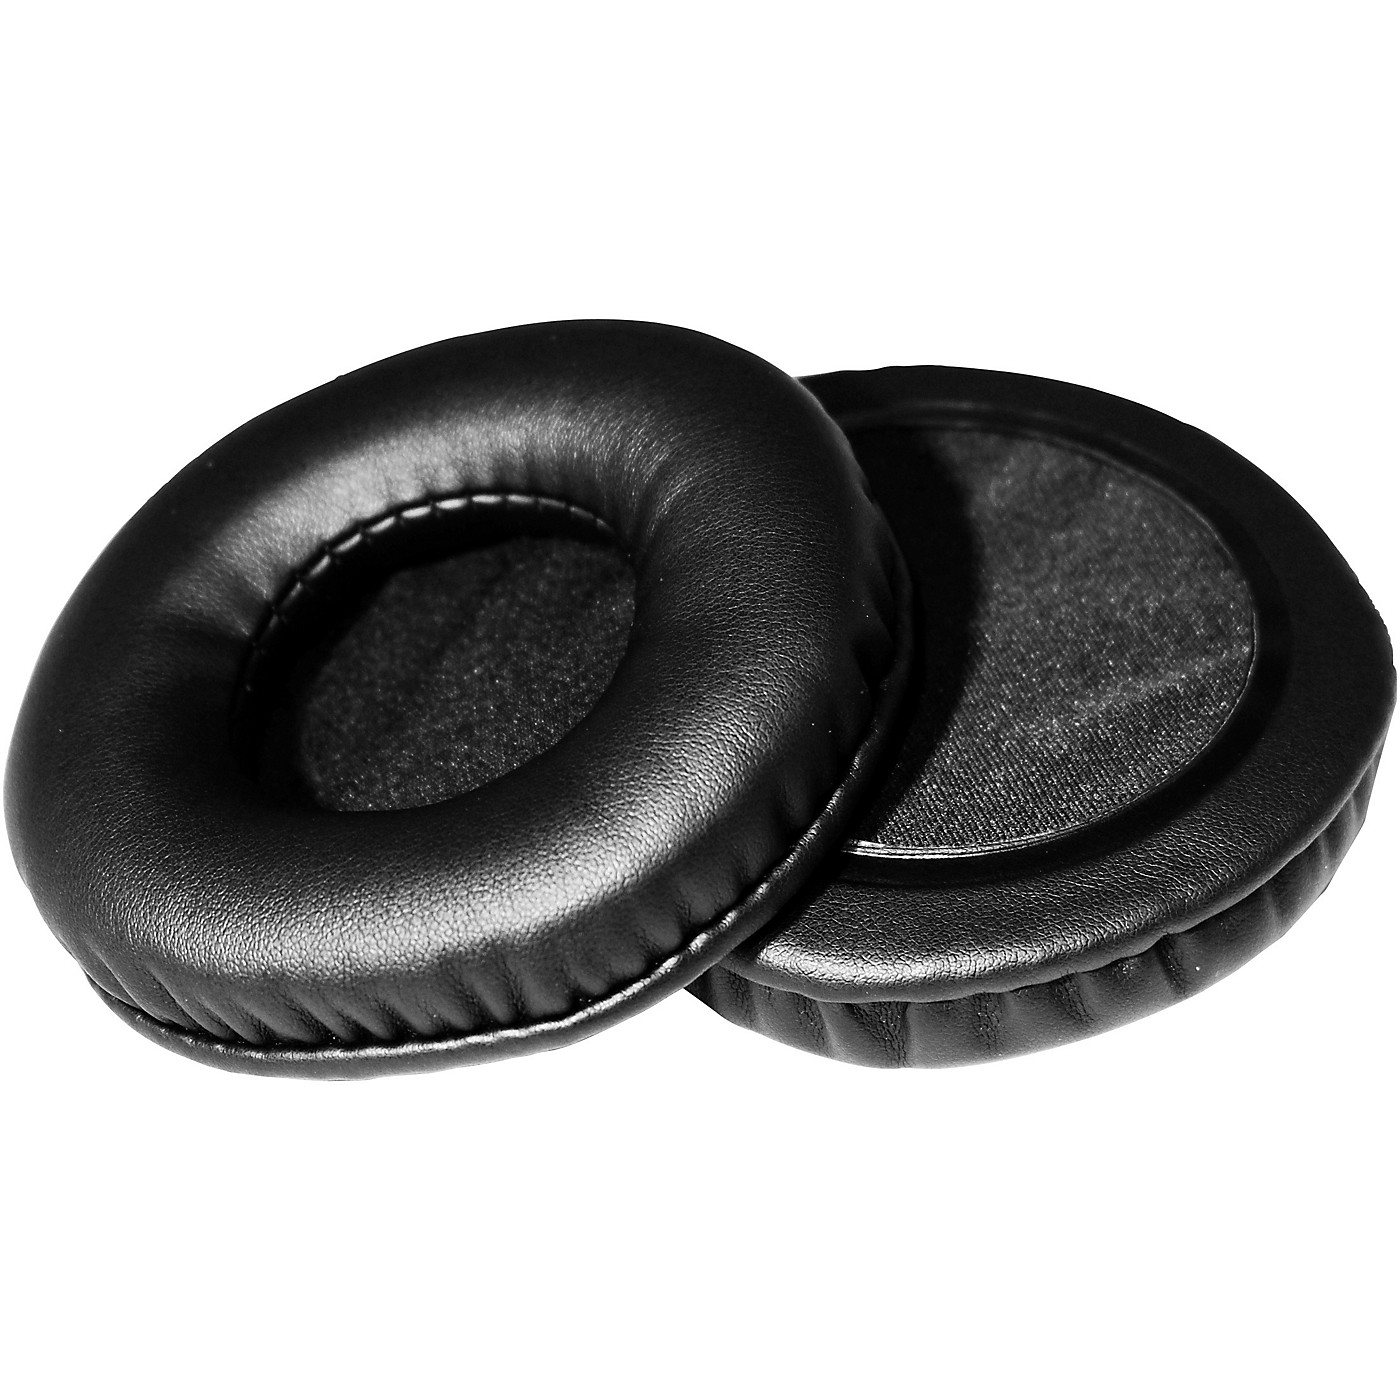 Dekoni Audio Standard Replacement Ear Pads for Technics RP-DH1200 thumbnail